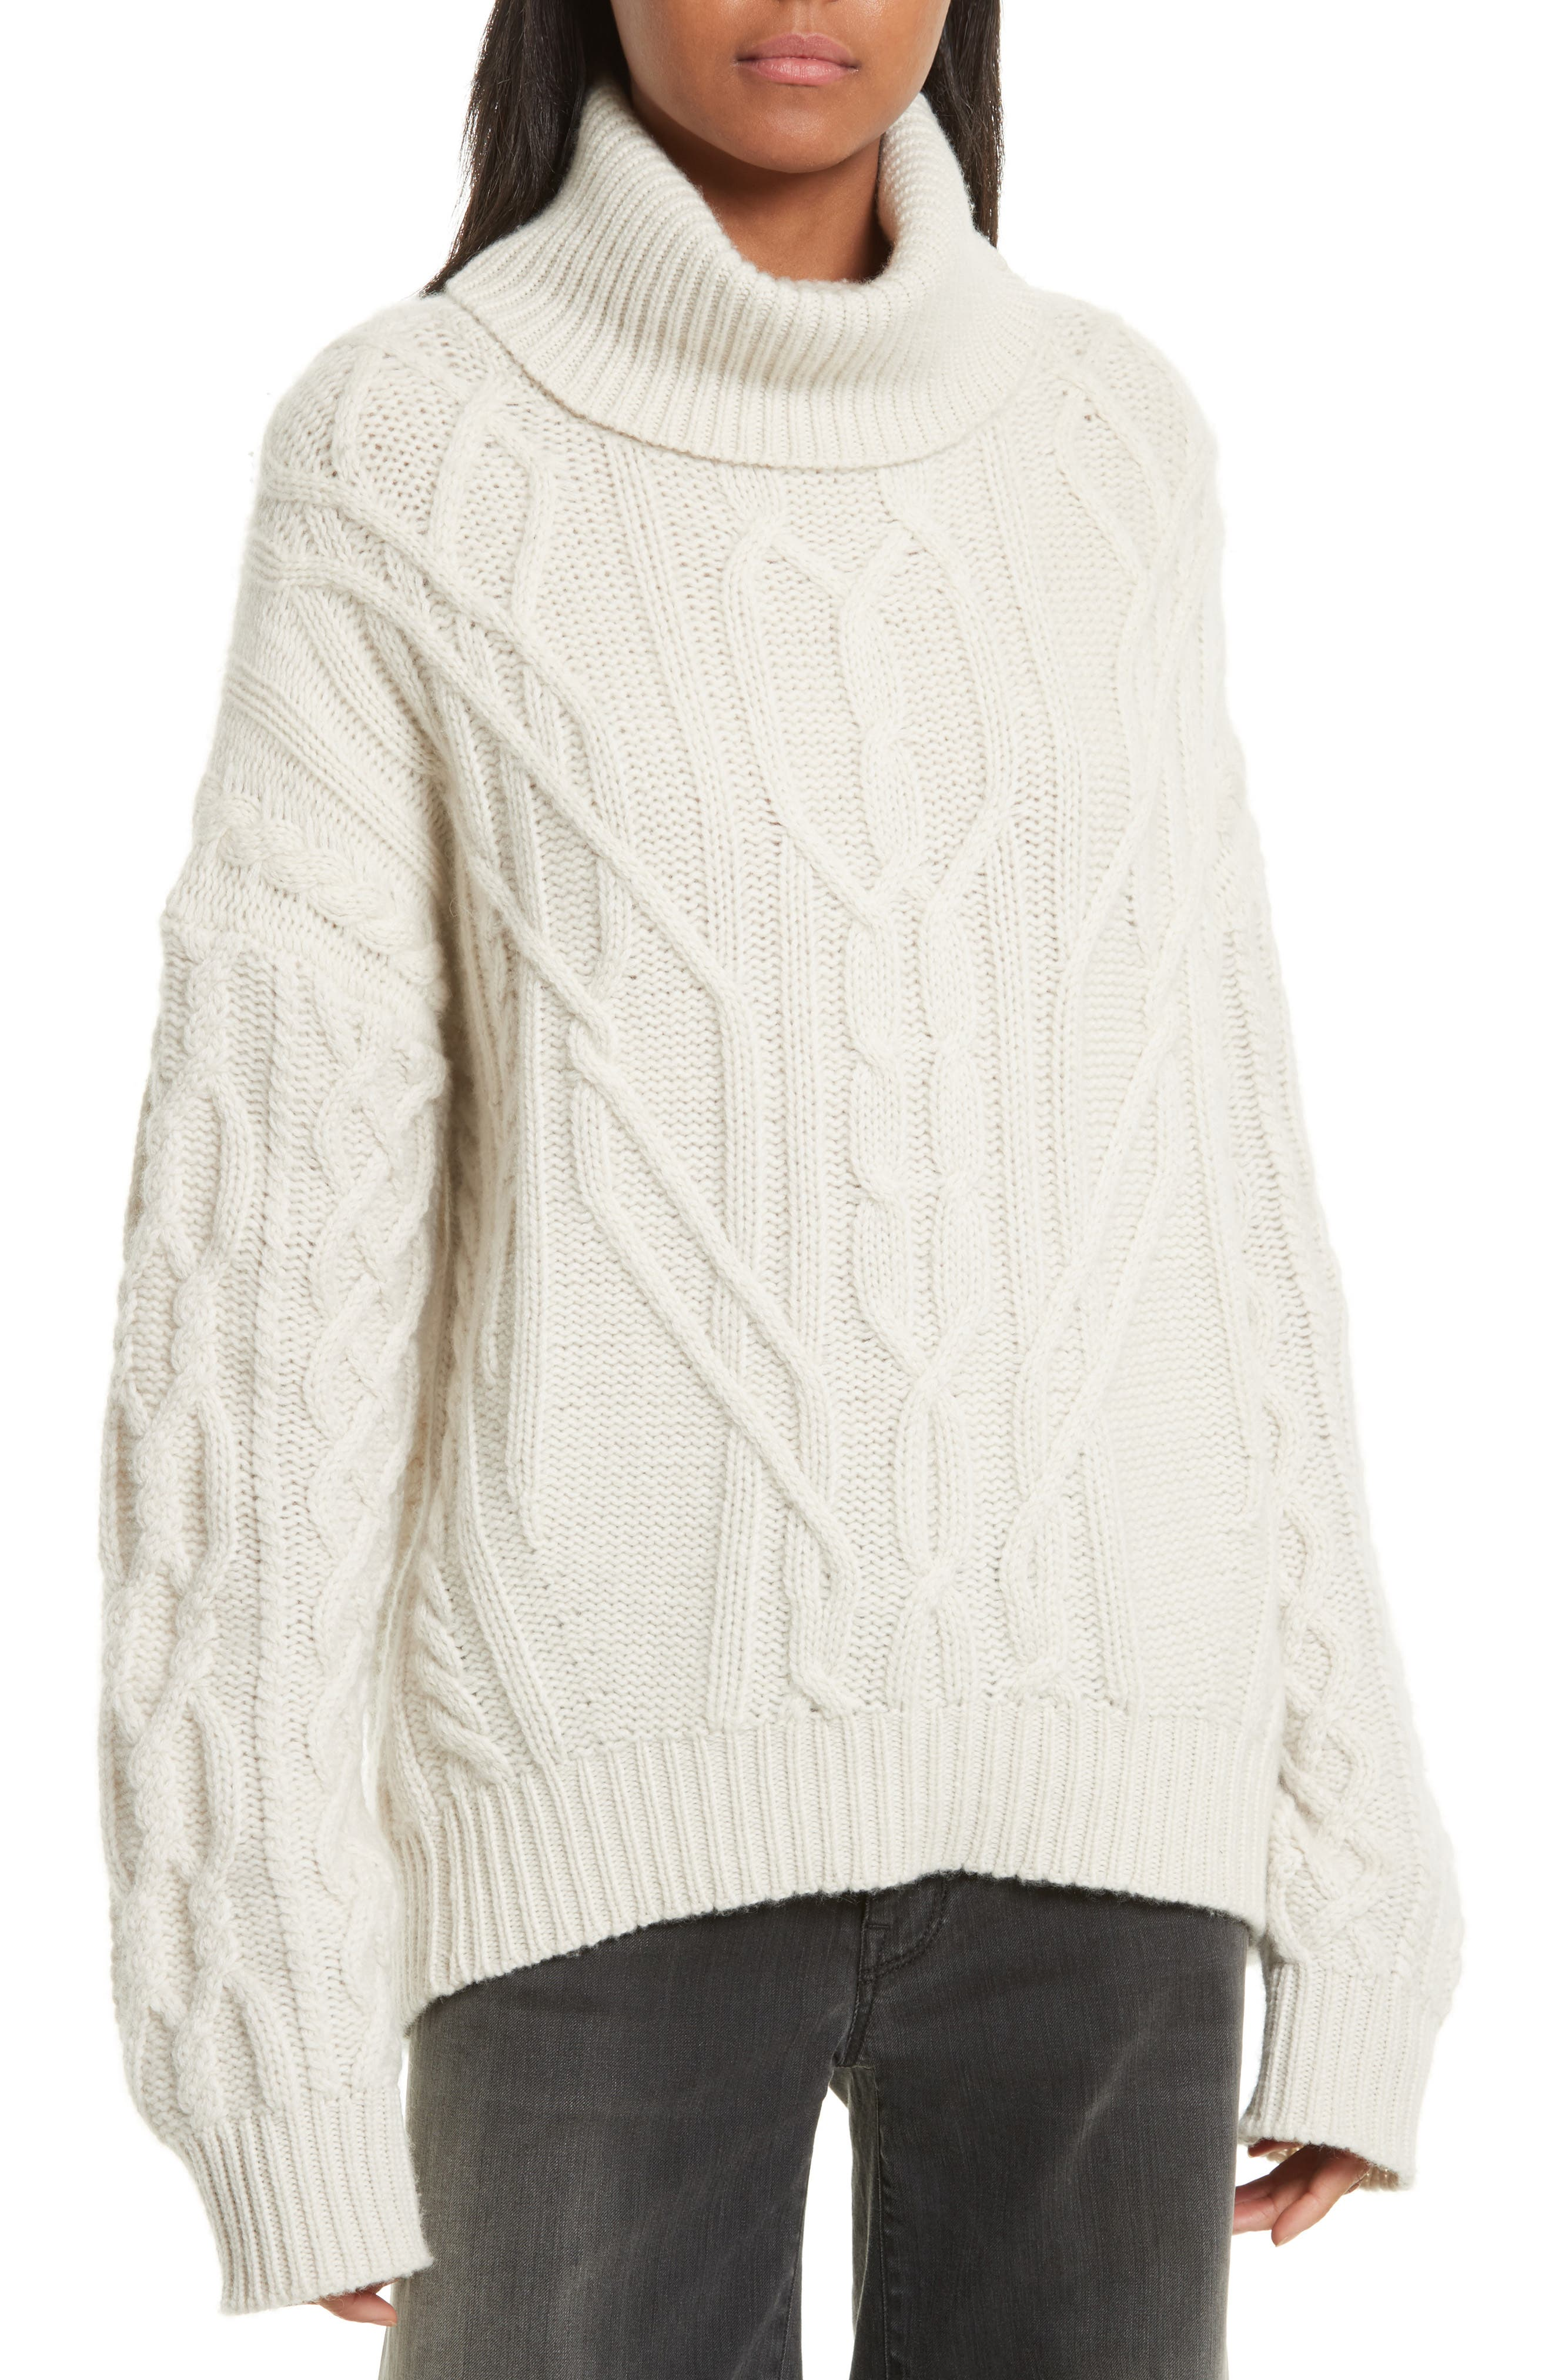 Nili Lotan Cecil Cable Knit Cashmere Turtleneck Sweater